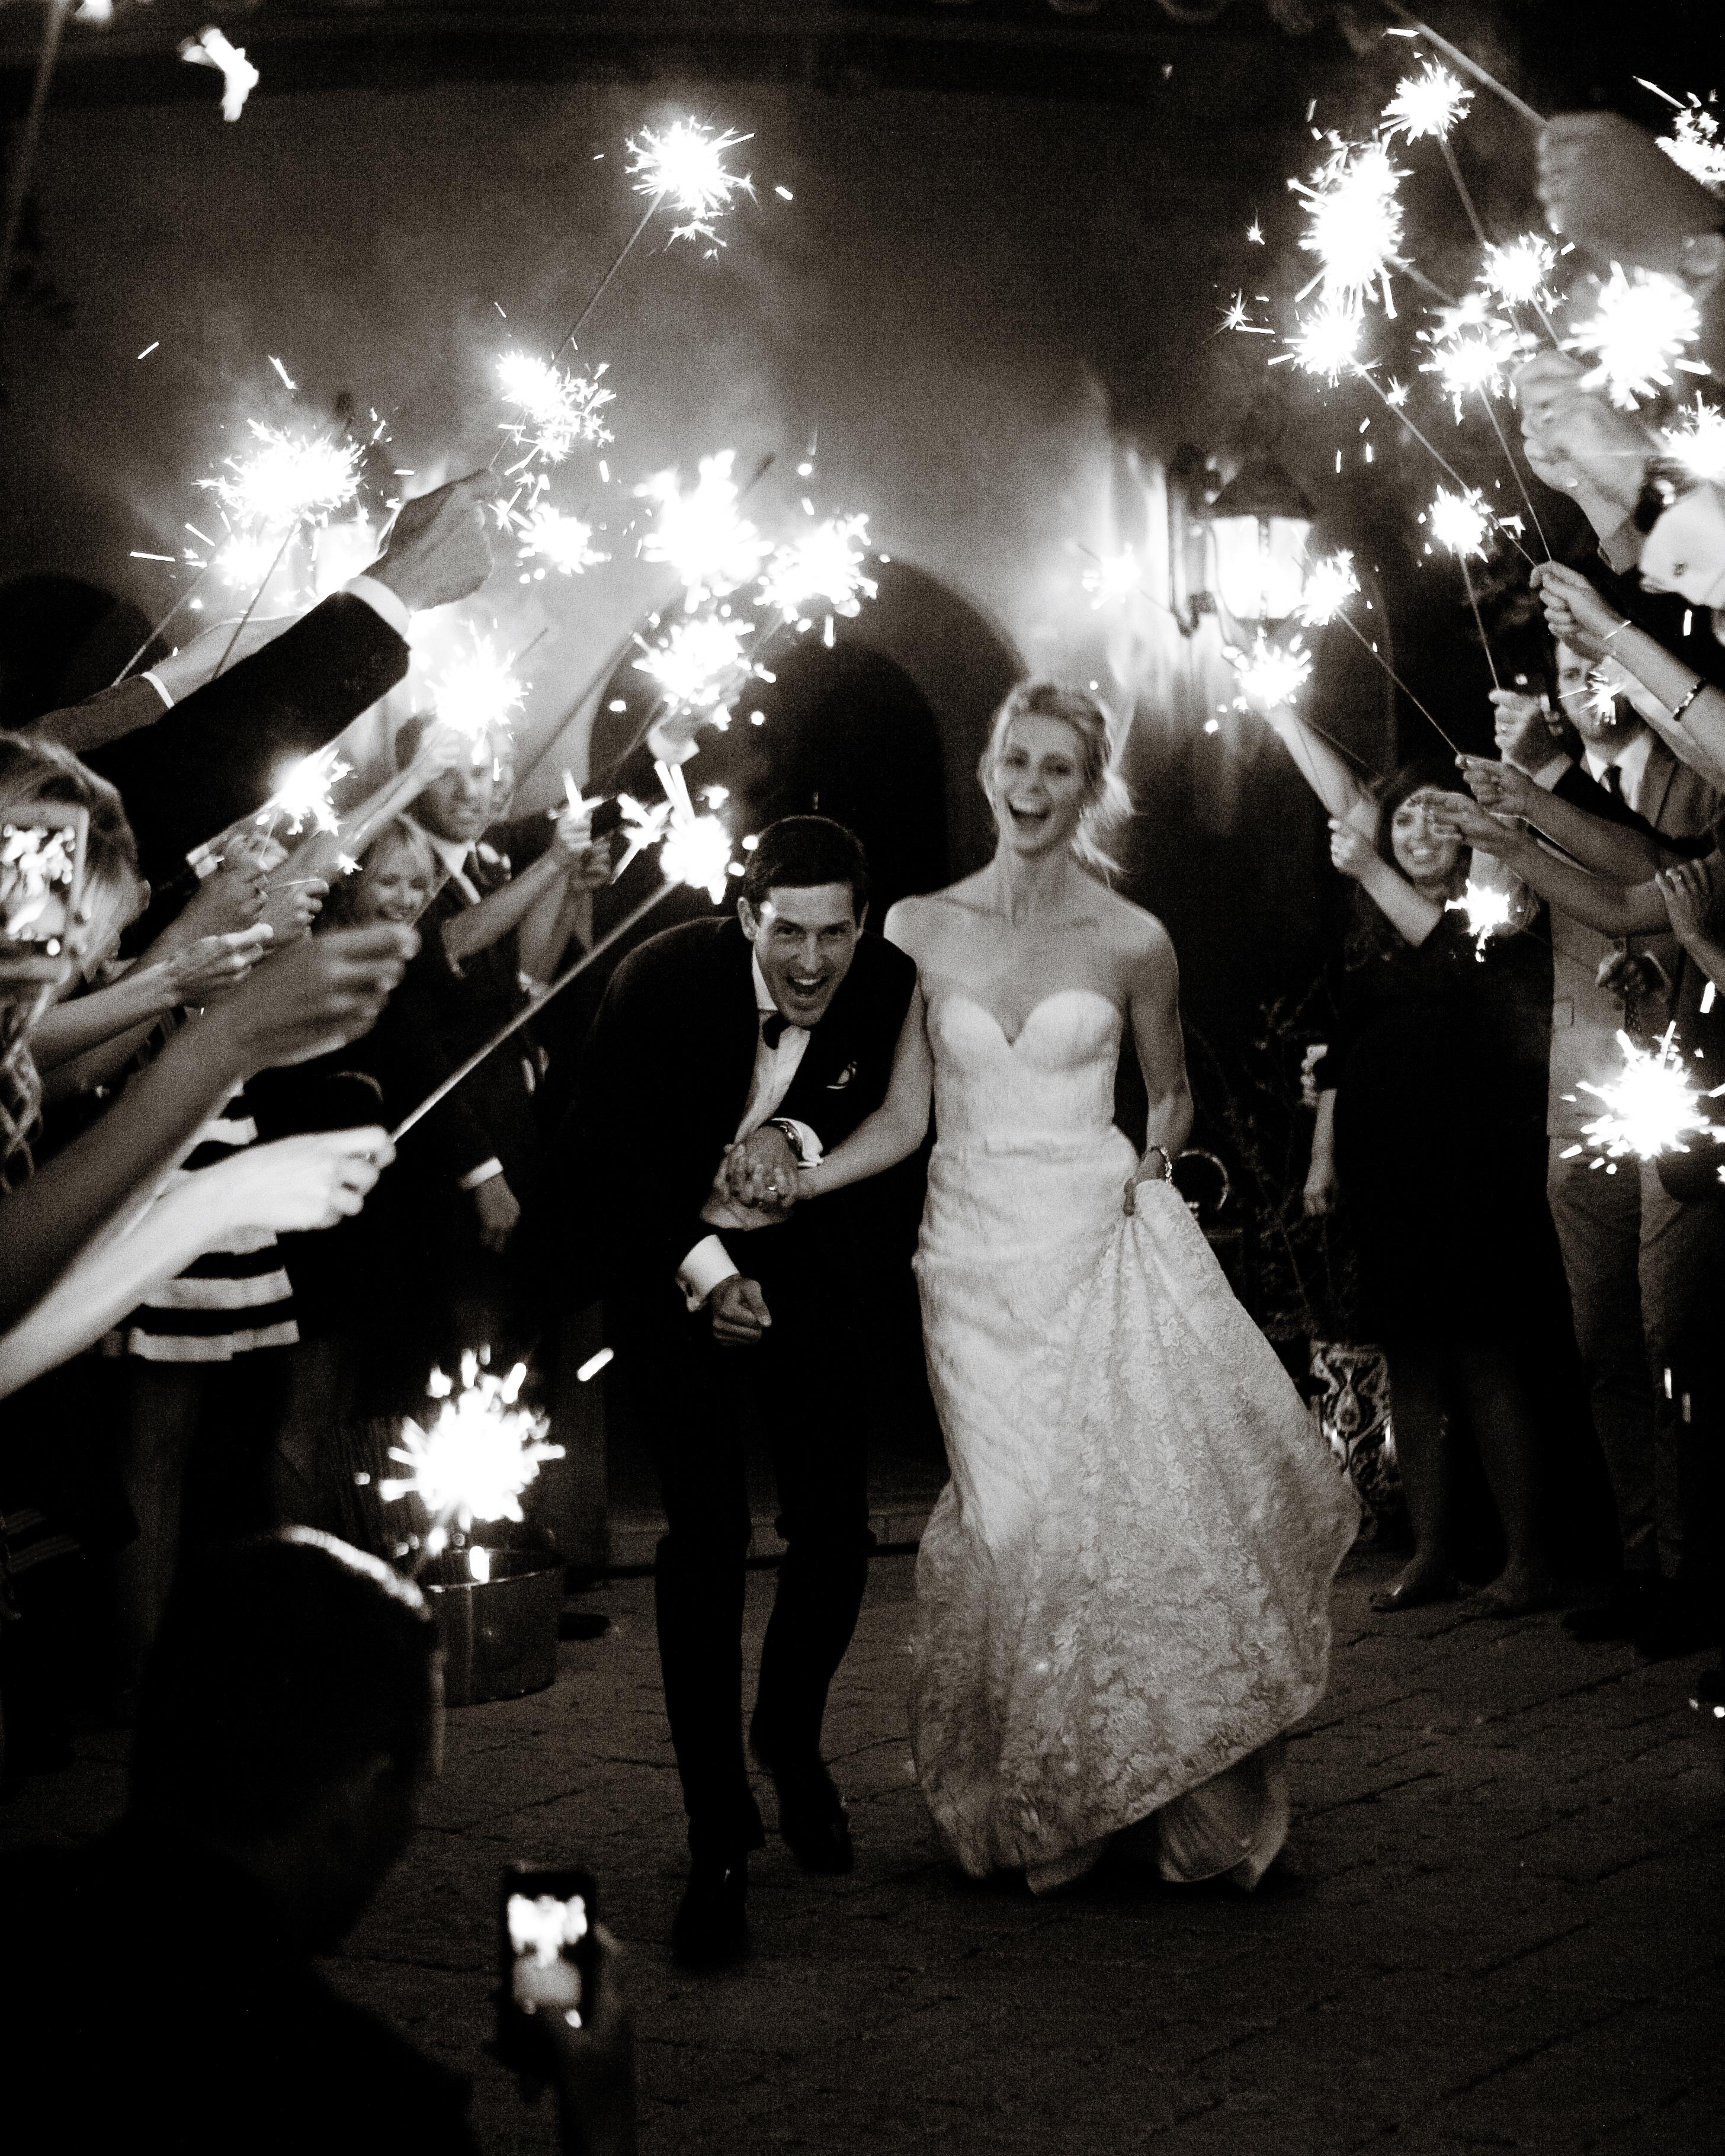 brooke-shea-wedding-731-d111277.jpg